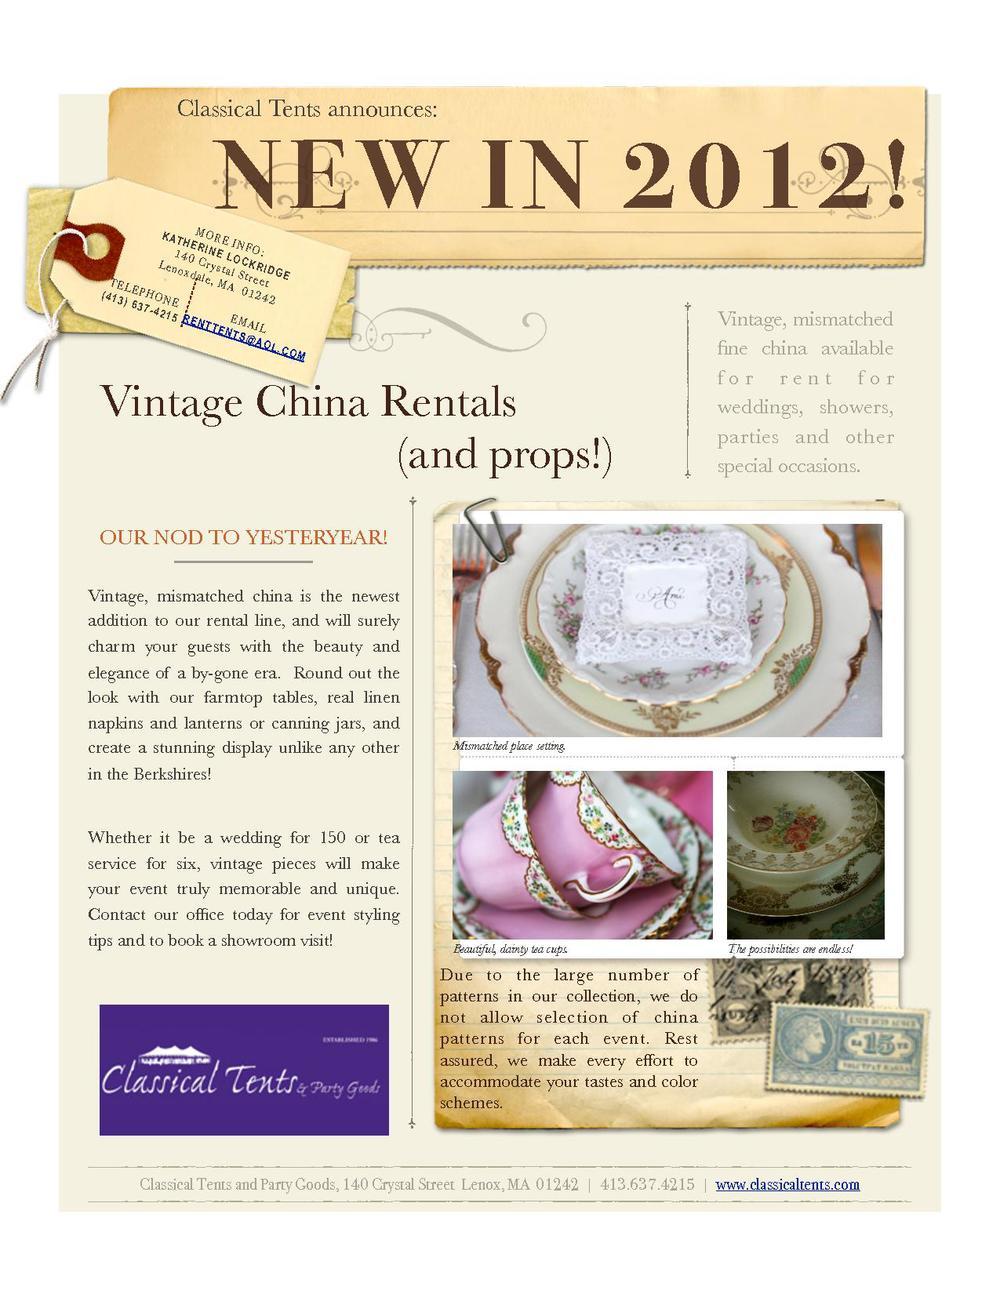 CT Vintage China mailer_150x150_p1.jpg